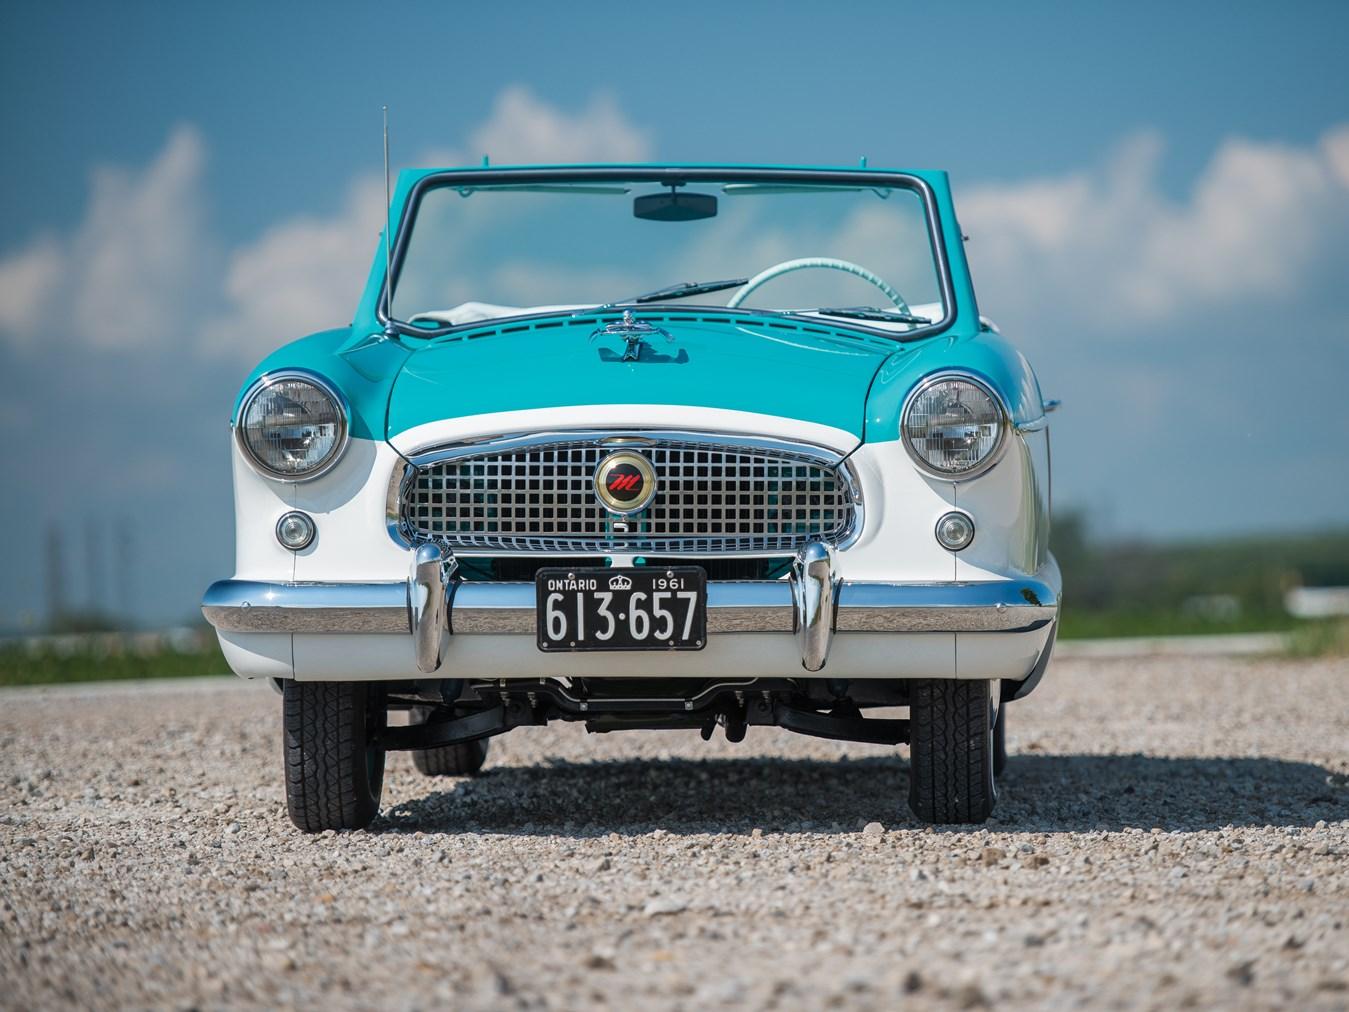 1961 AMC Metropolitan 1500 Convertible front